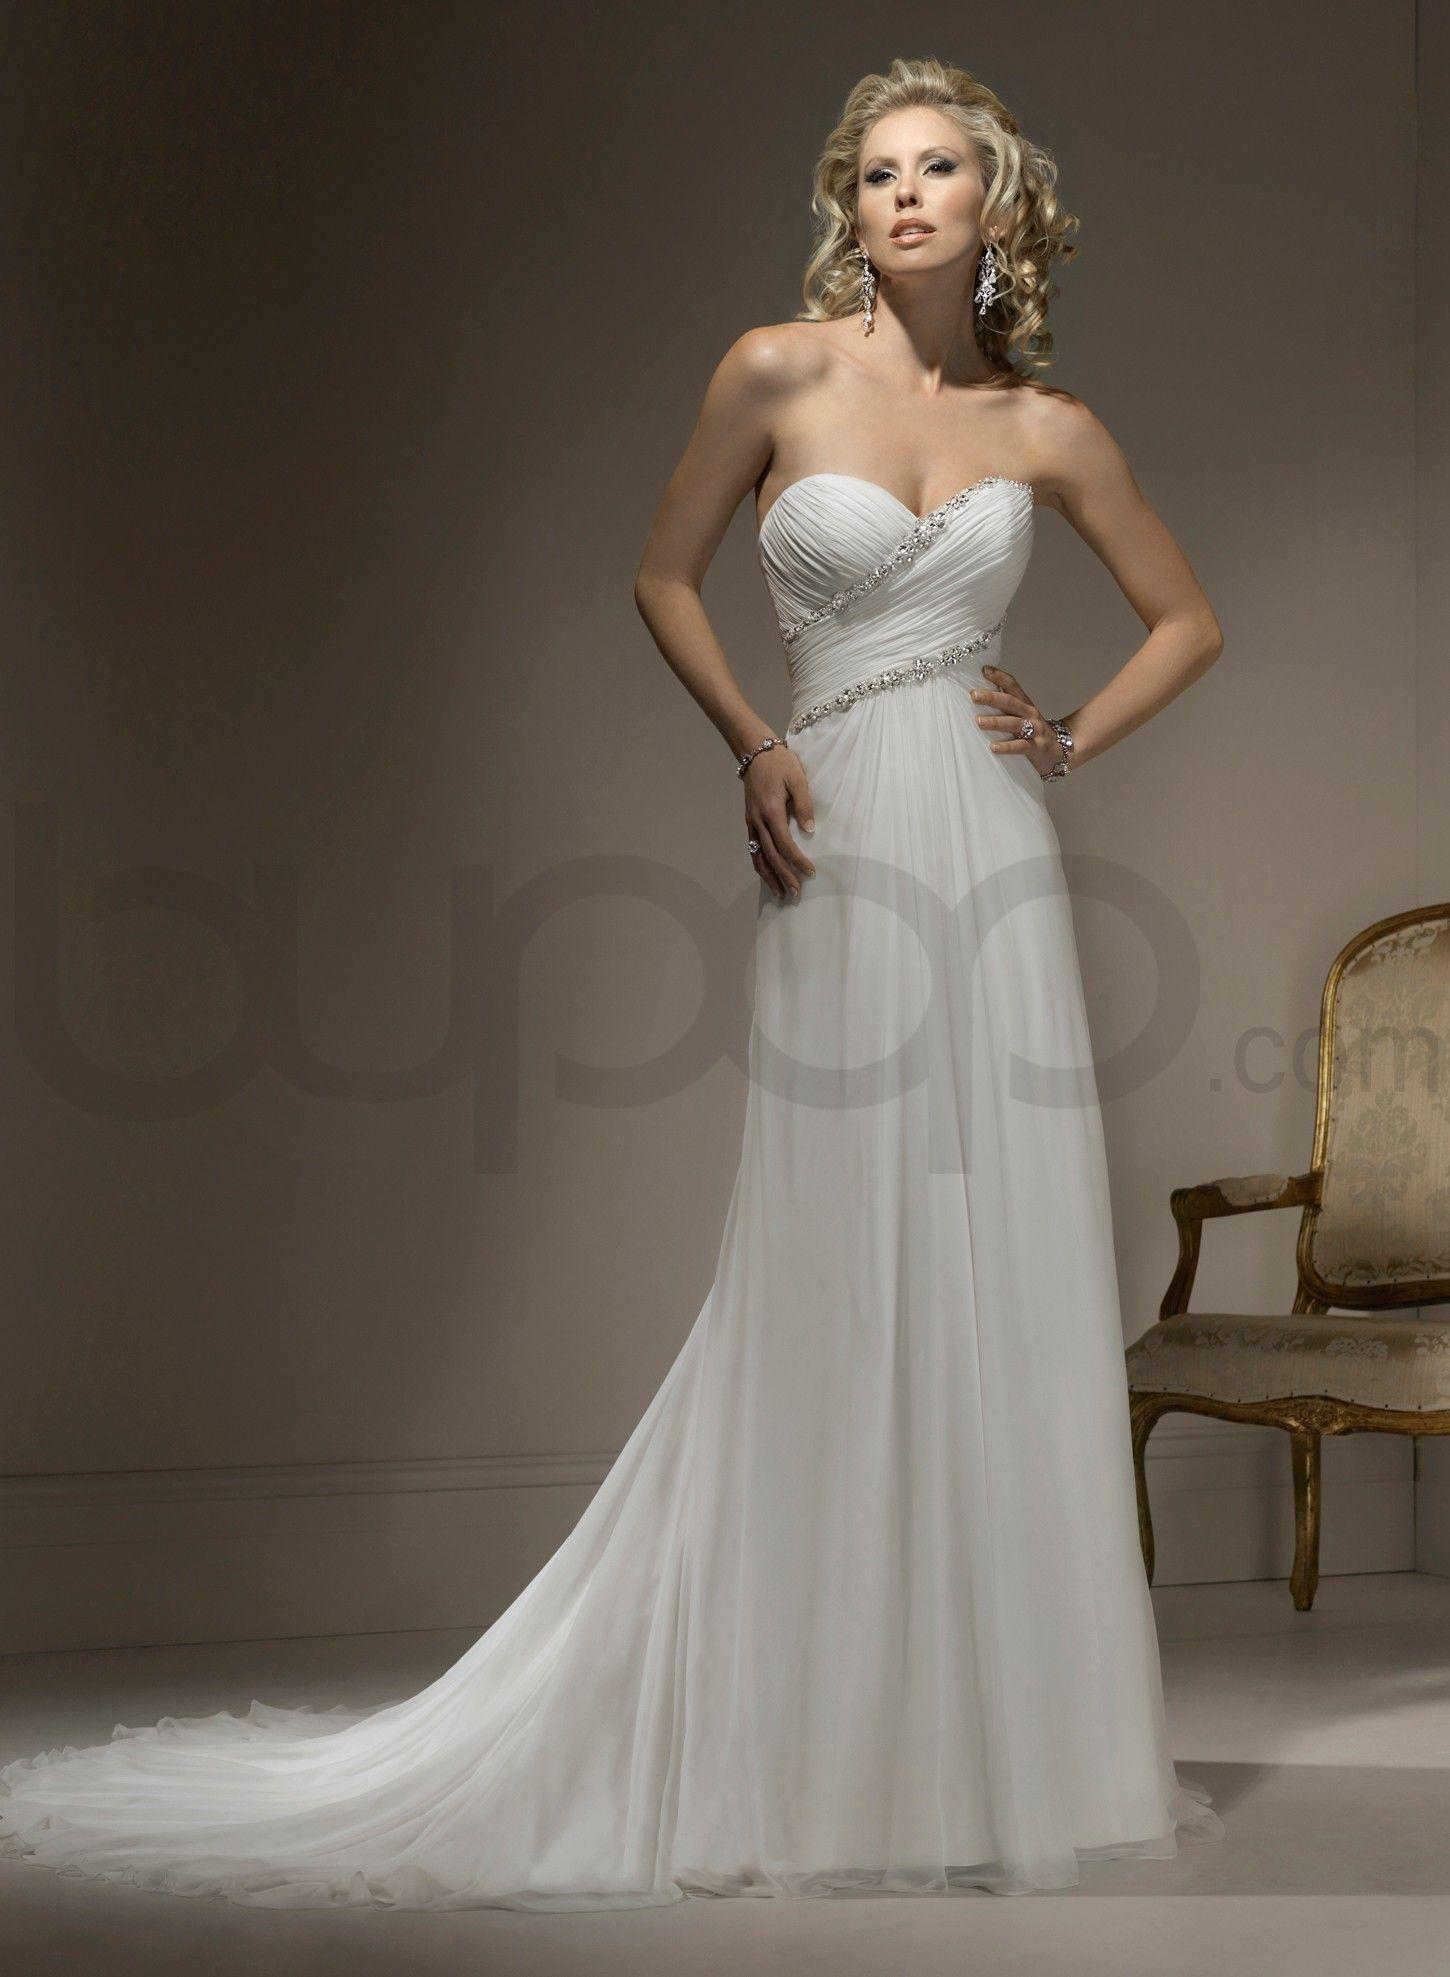 Strapless Sweetheart Wedding Dresses - Ocodea.com